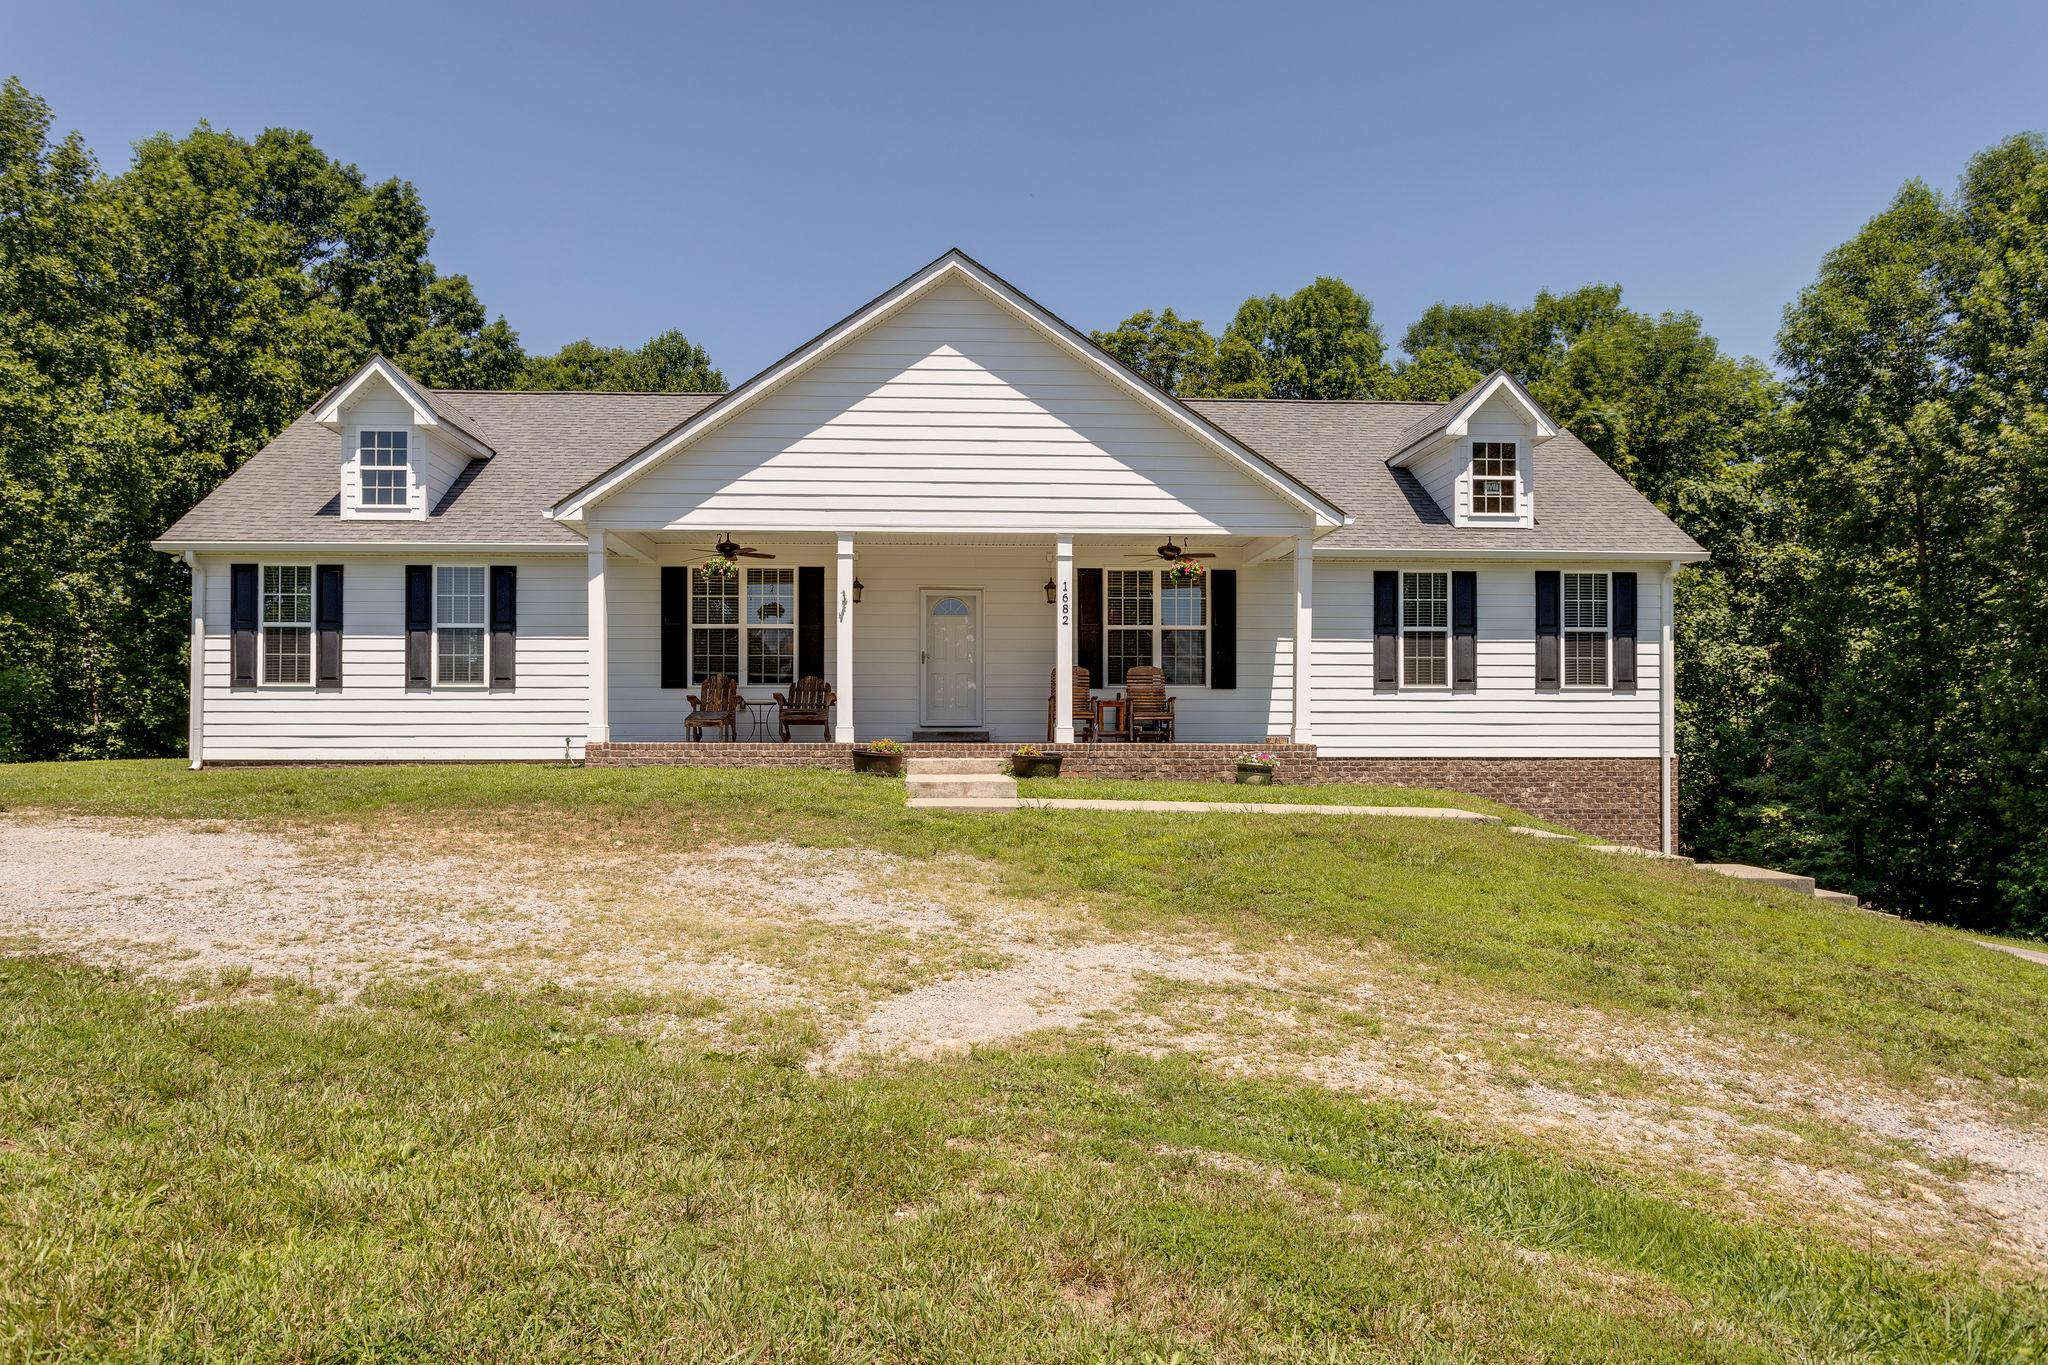 1682 Grants Rd, Columbia, TN 38401 - Columbia, TN real estate listing